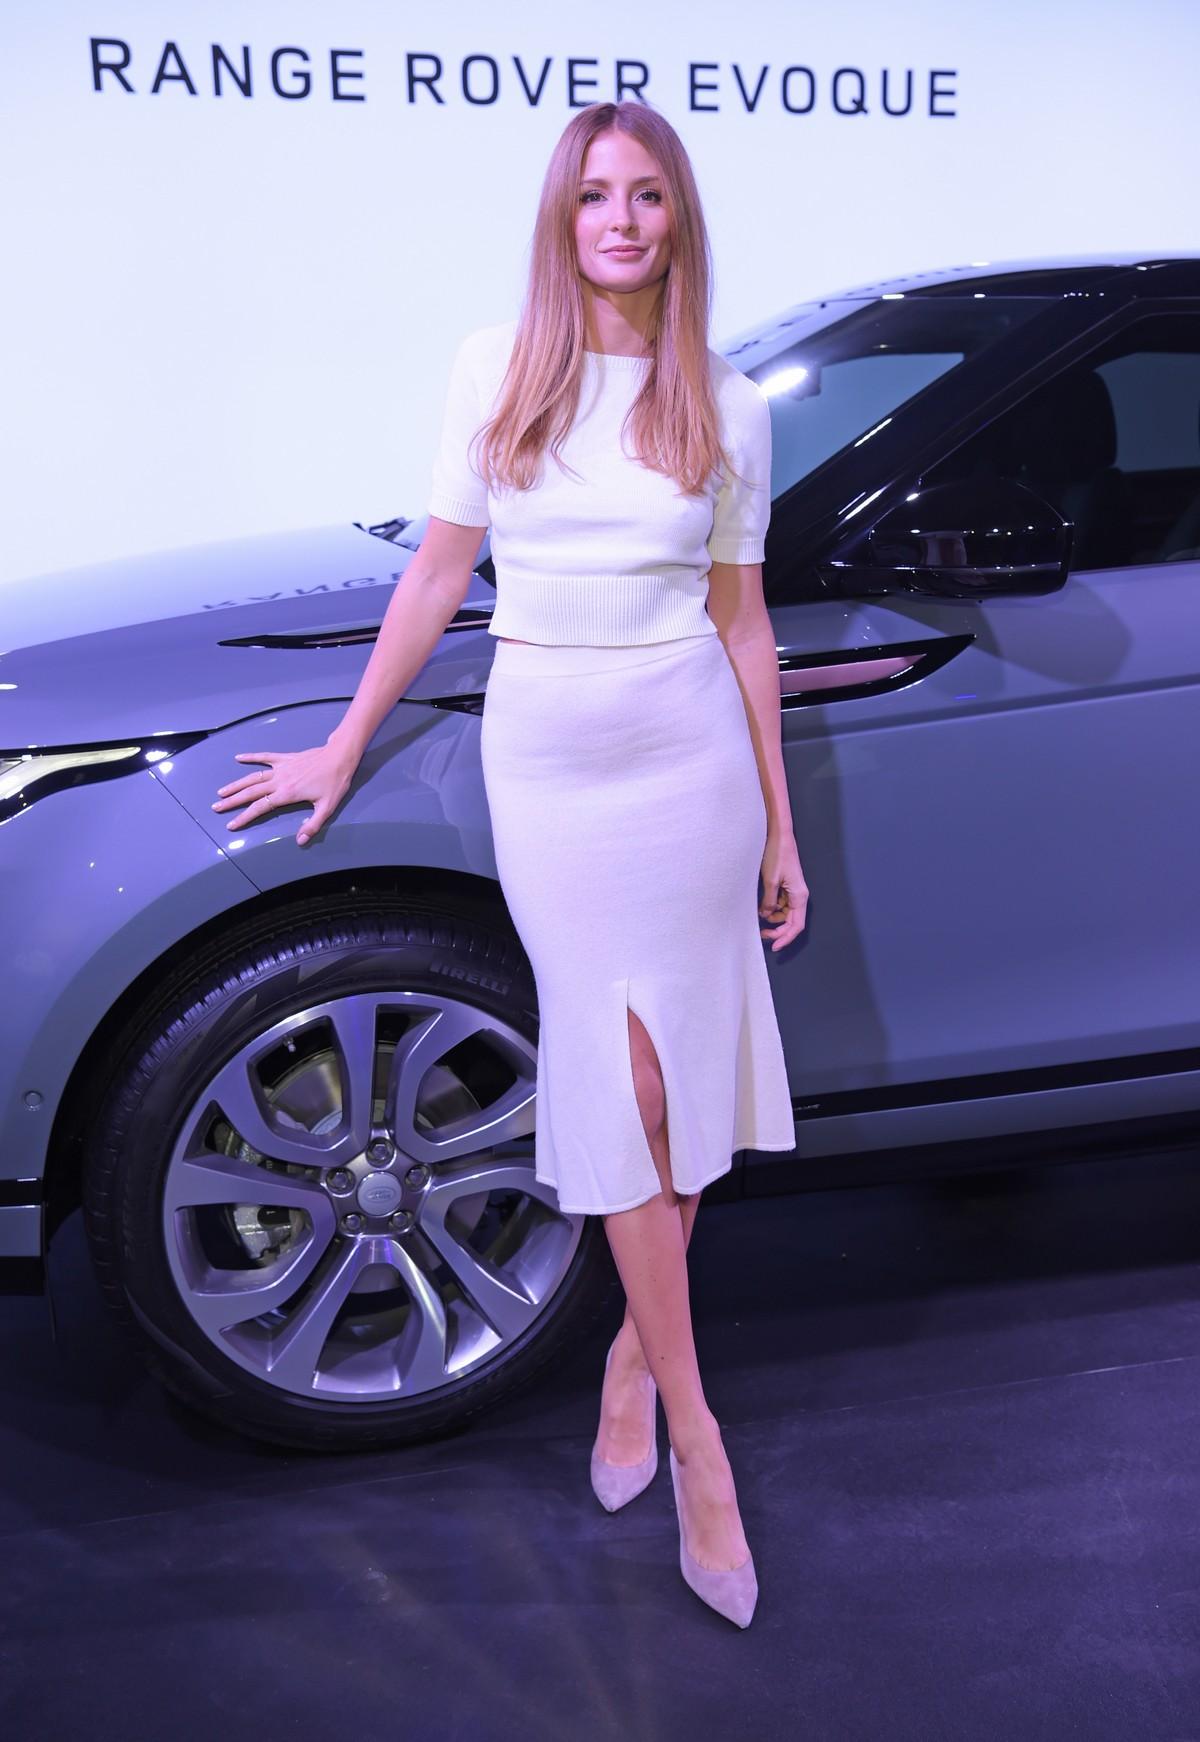 Nuova Range Rover Evoque 2019